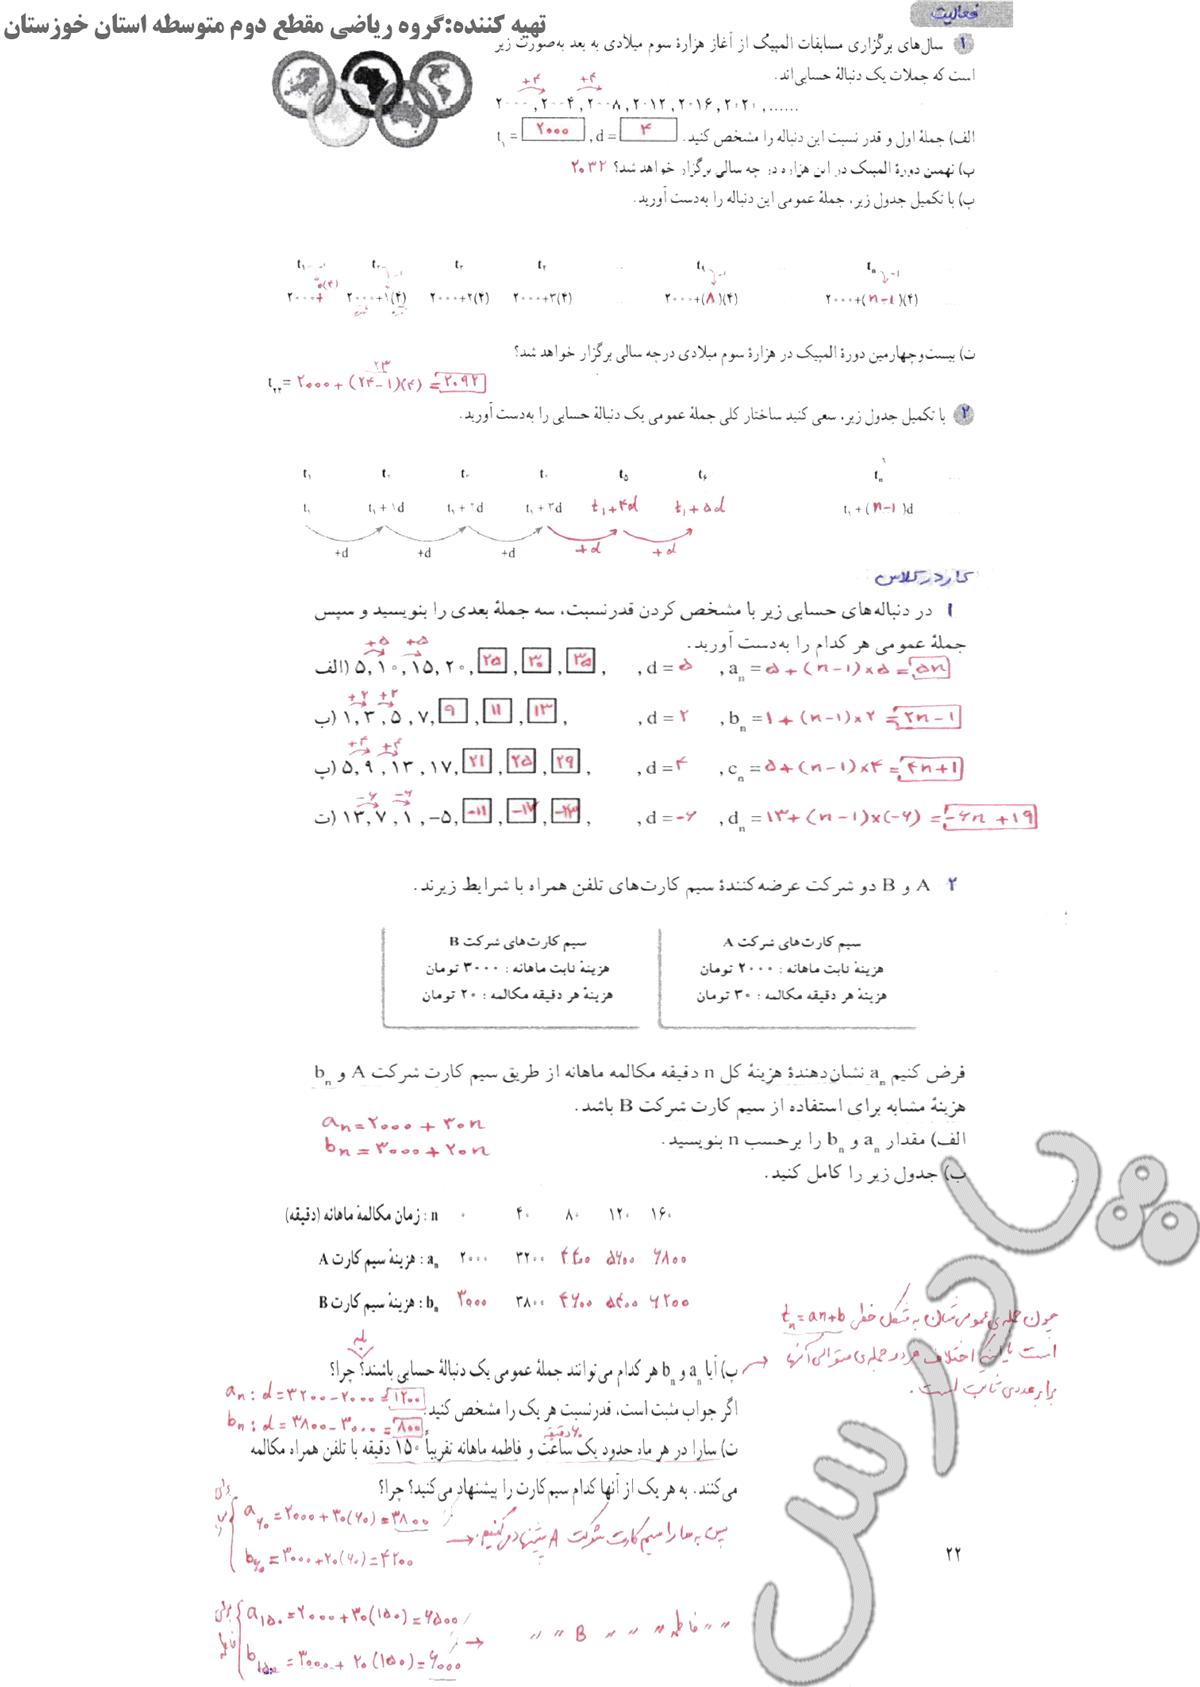 حل فعالیت وکاردر کلاس ص 21 و 22